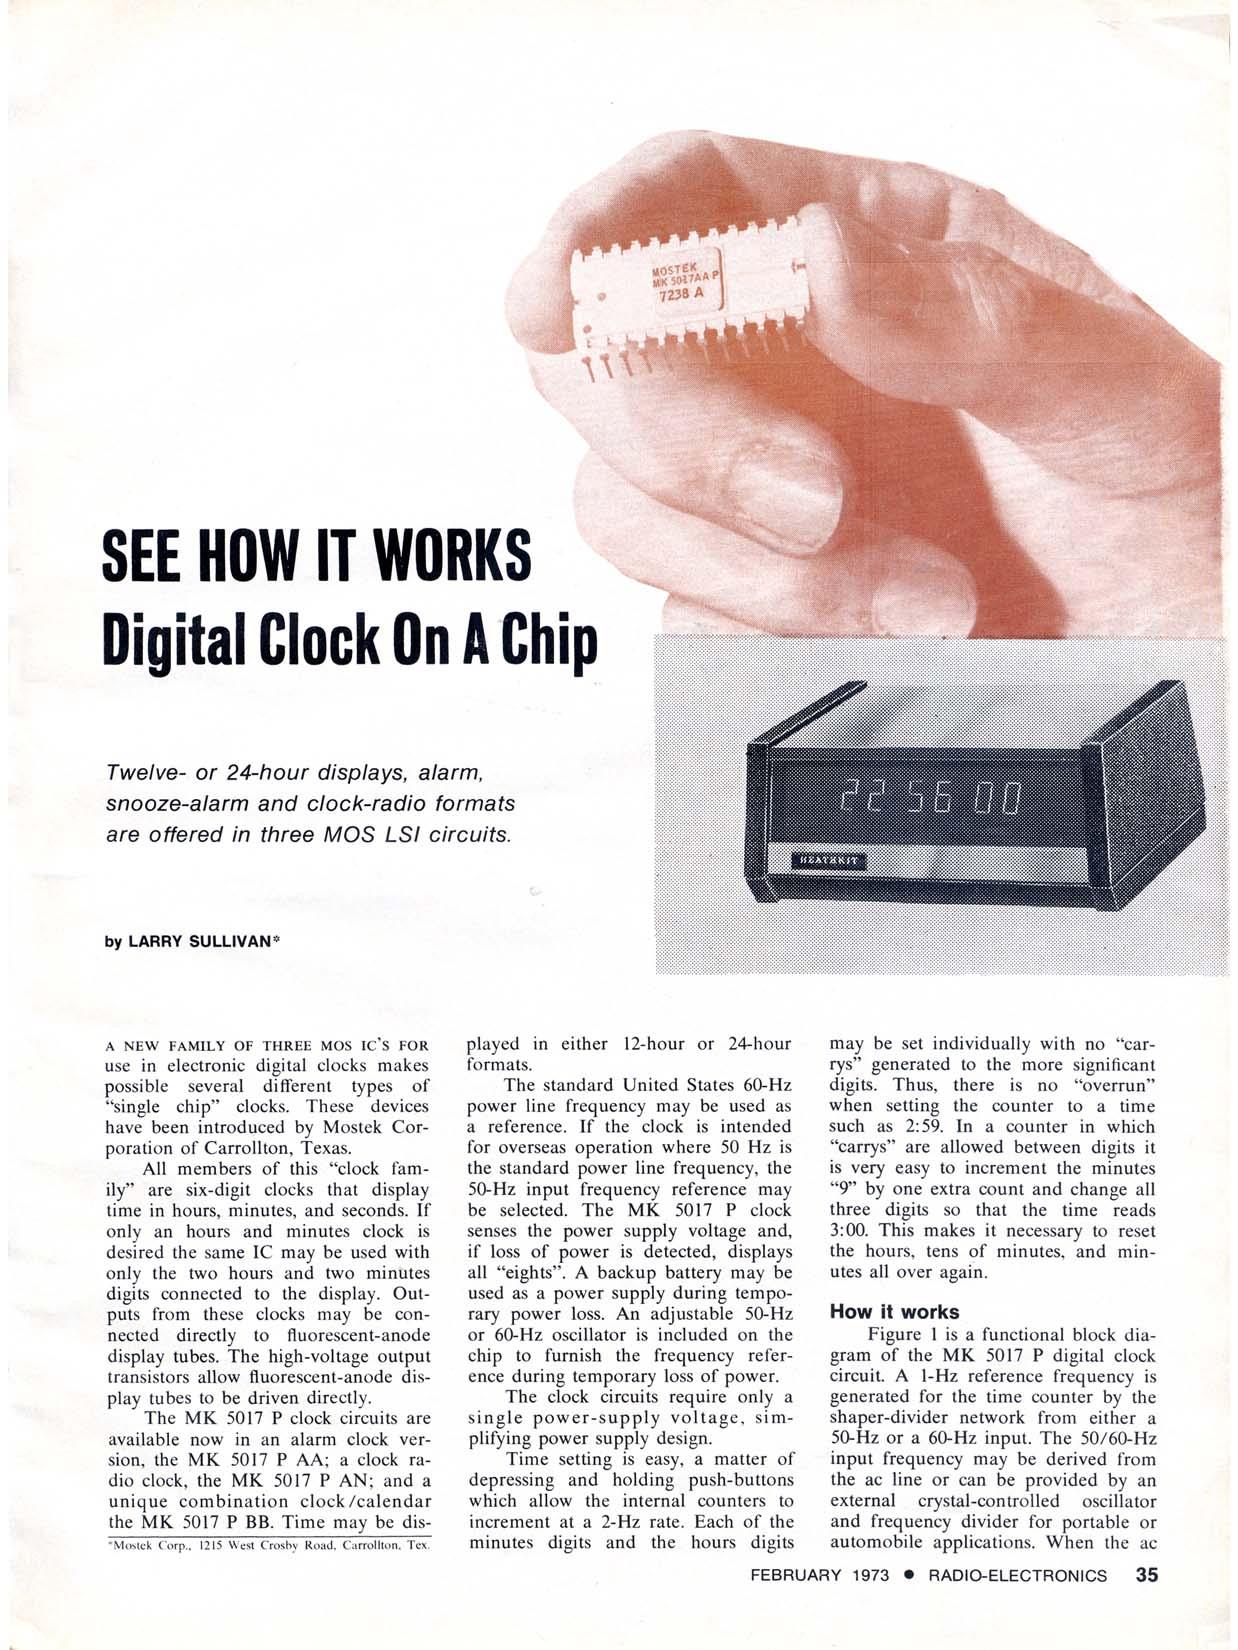 Heathkit Clocks 24hour Digital Clock And Timer Circuit